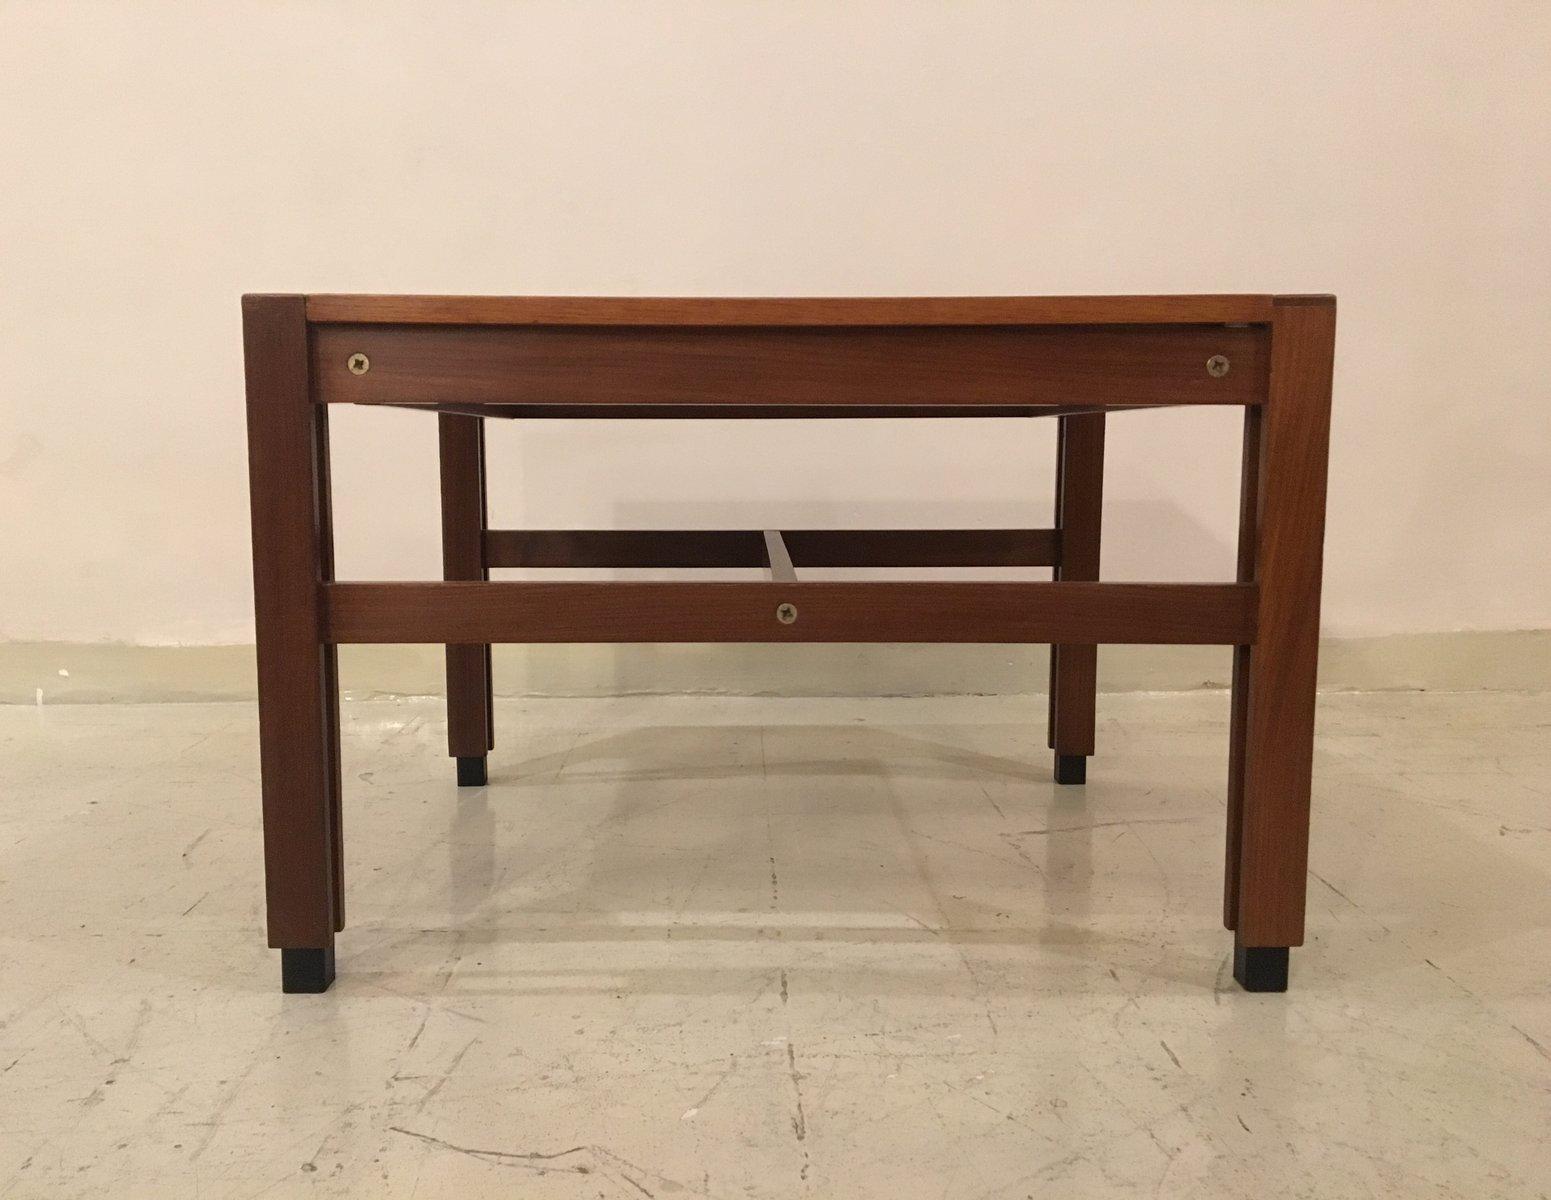 Arona low table by ico luisa parisi for mim mobili for Design mobili italiani